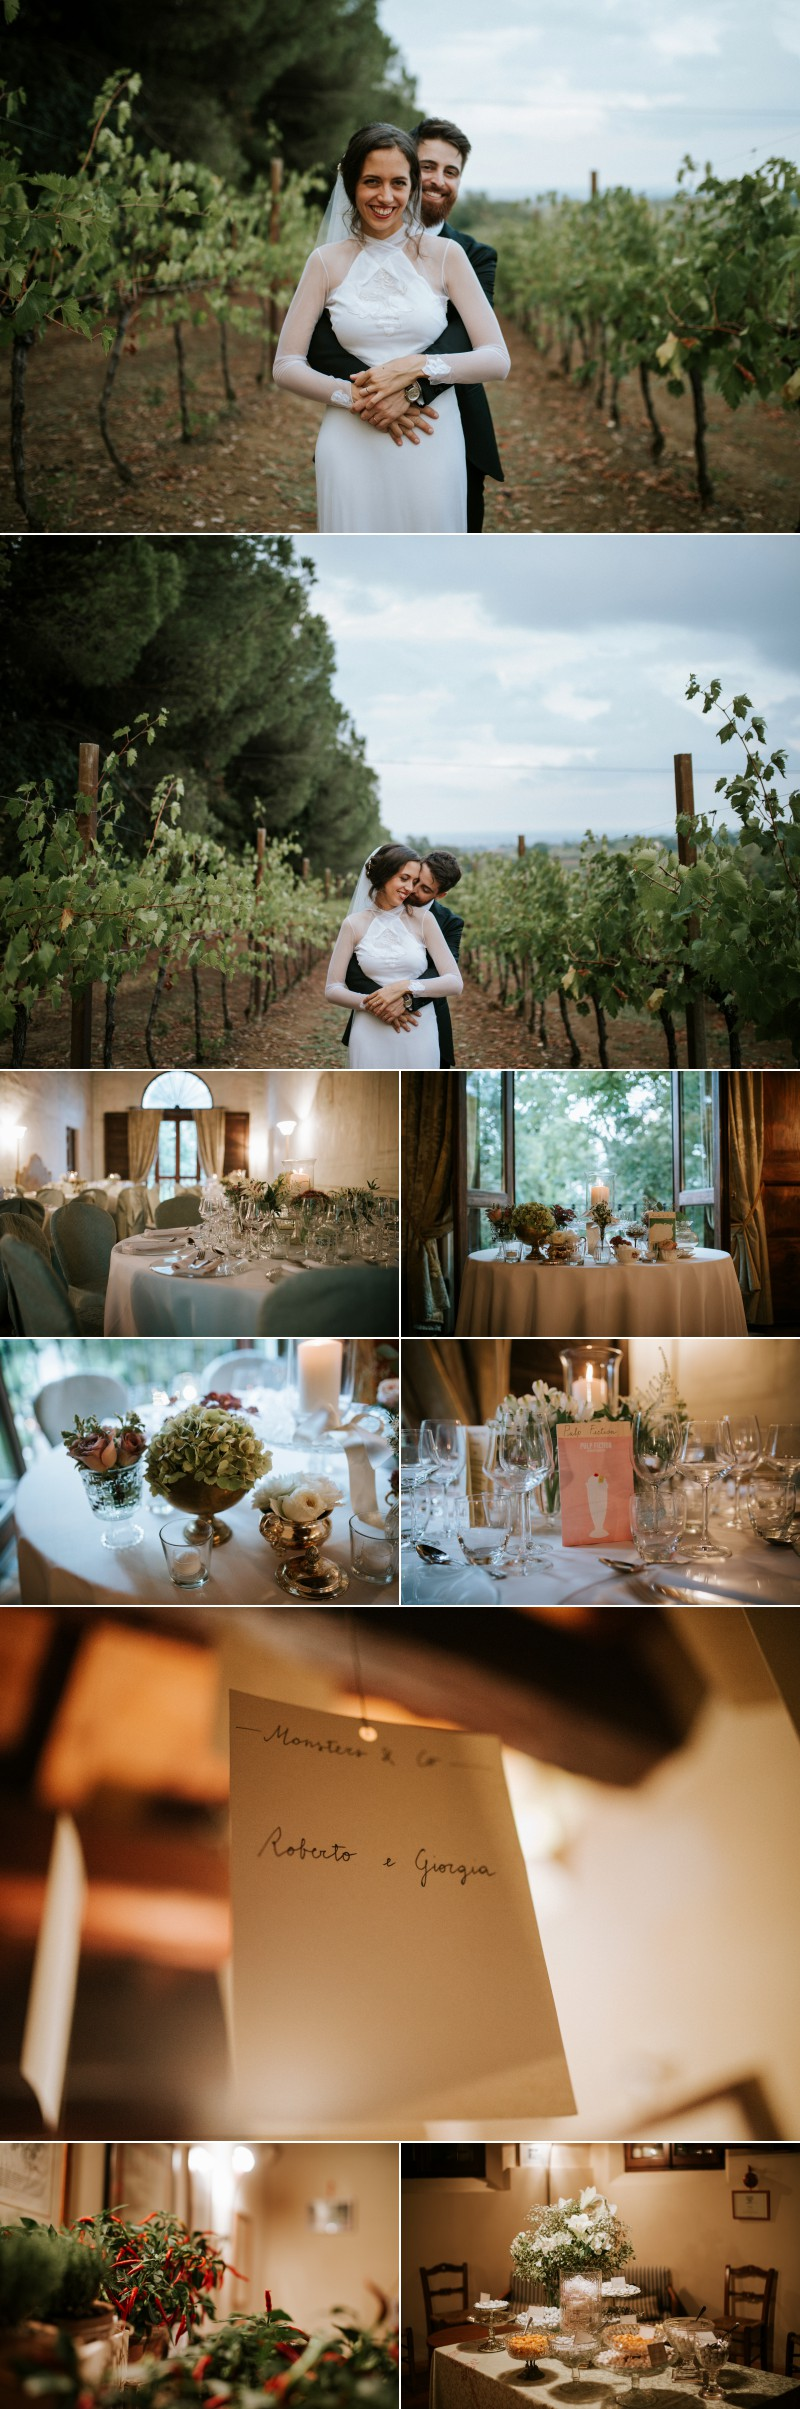 Bologna Ravenna Destination Wedding Photographer 9